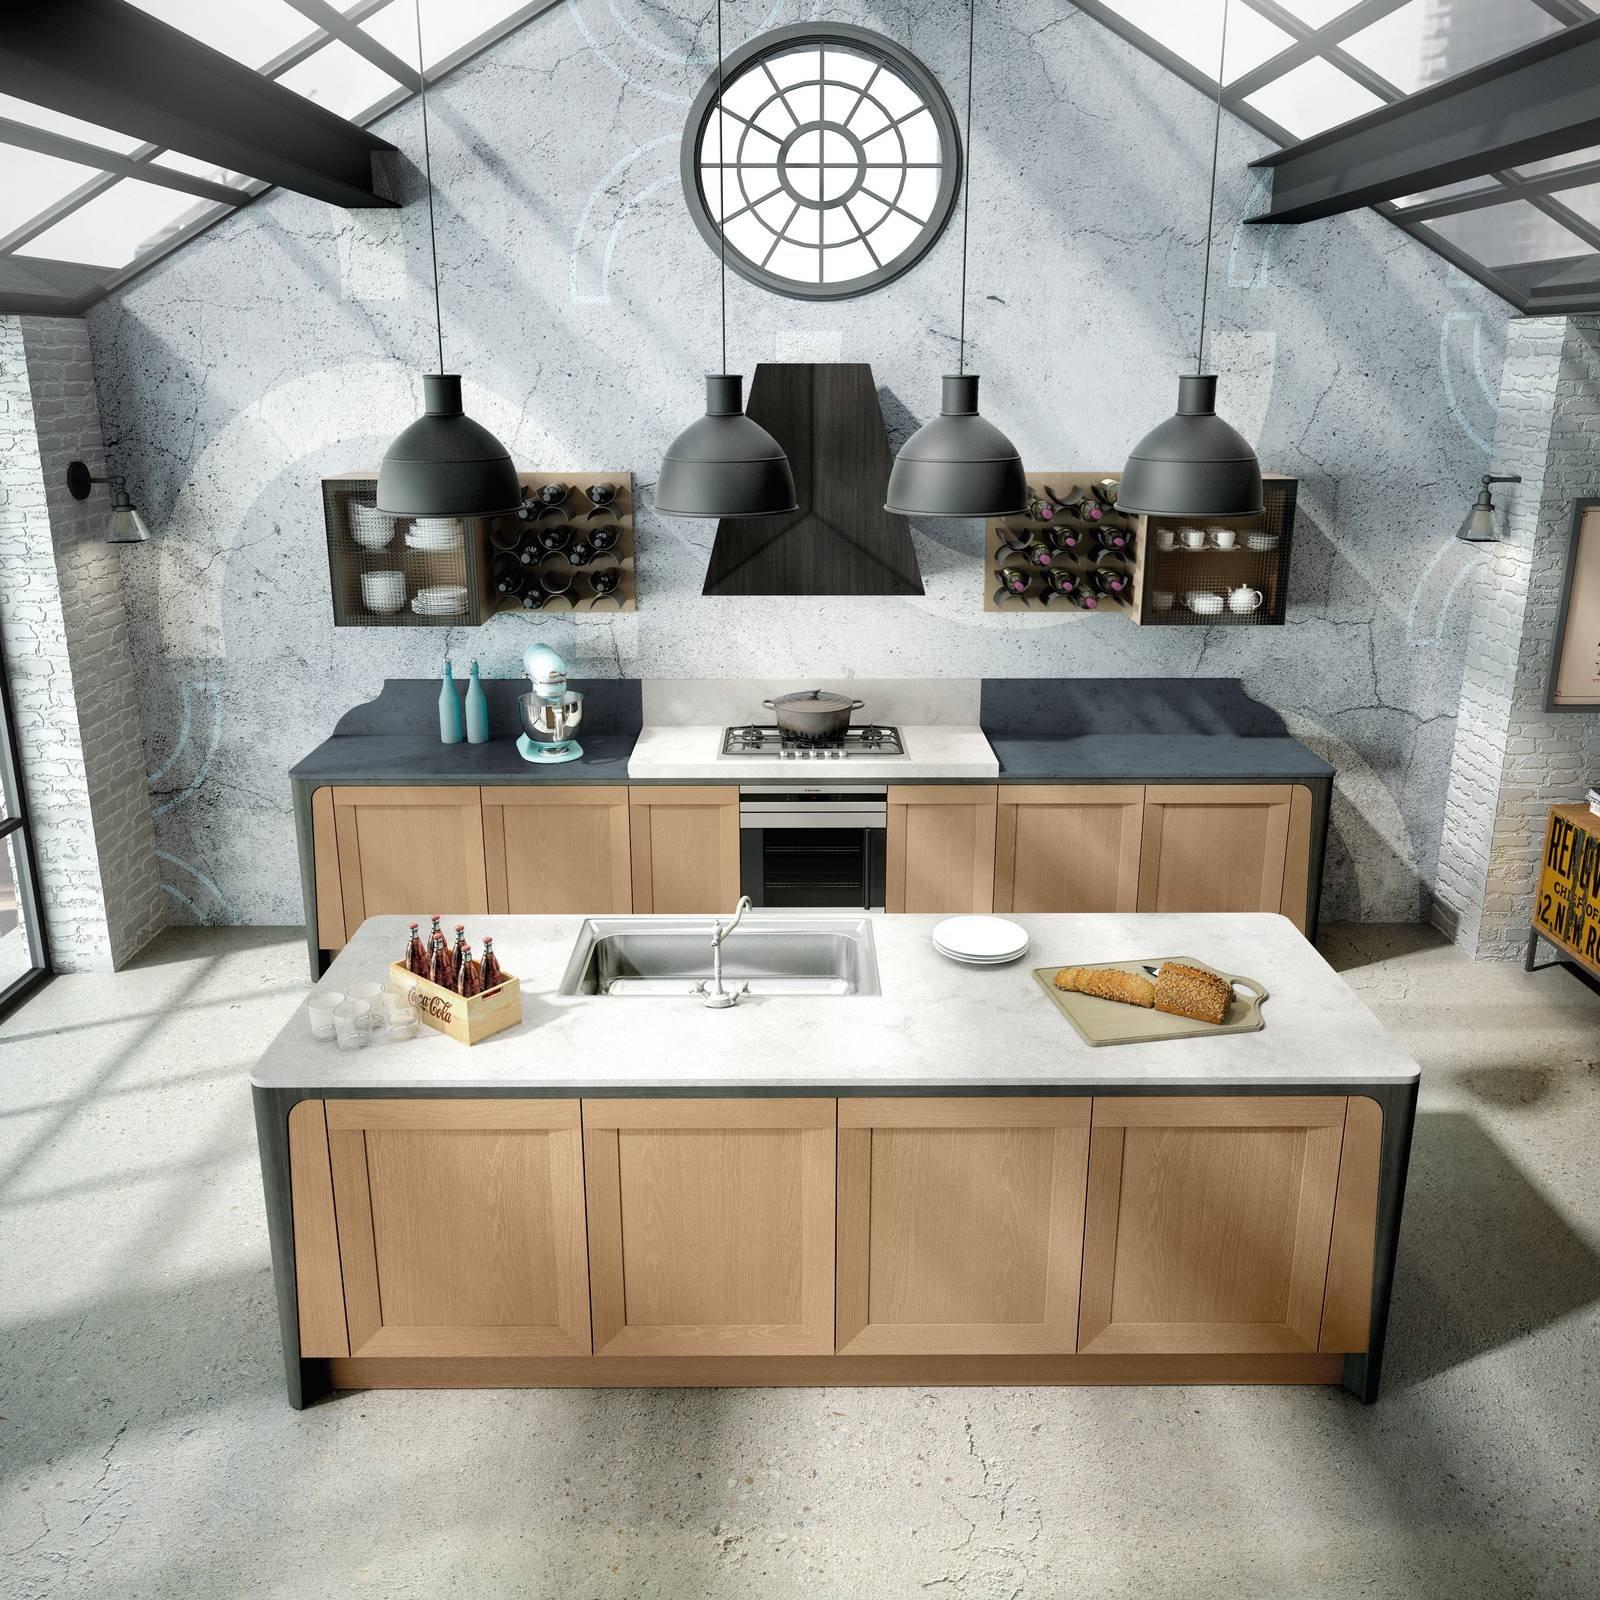 Cucina con l 39 isola in genere divise in due blocchi cose di casa - Cucine berloni 2017 ...